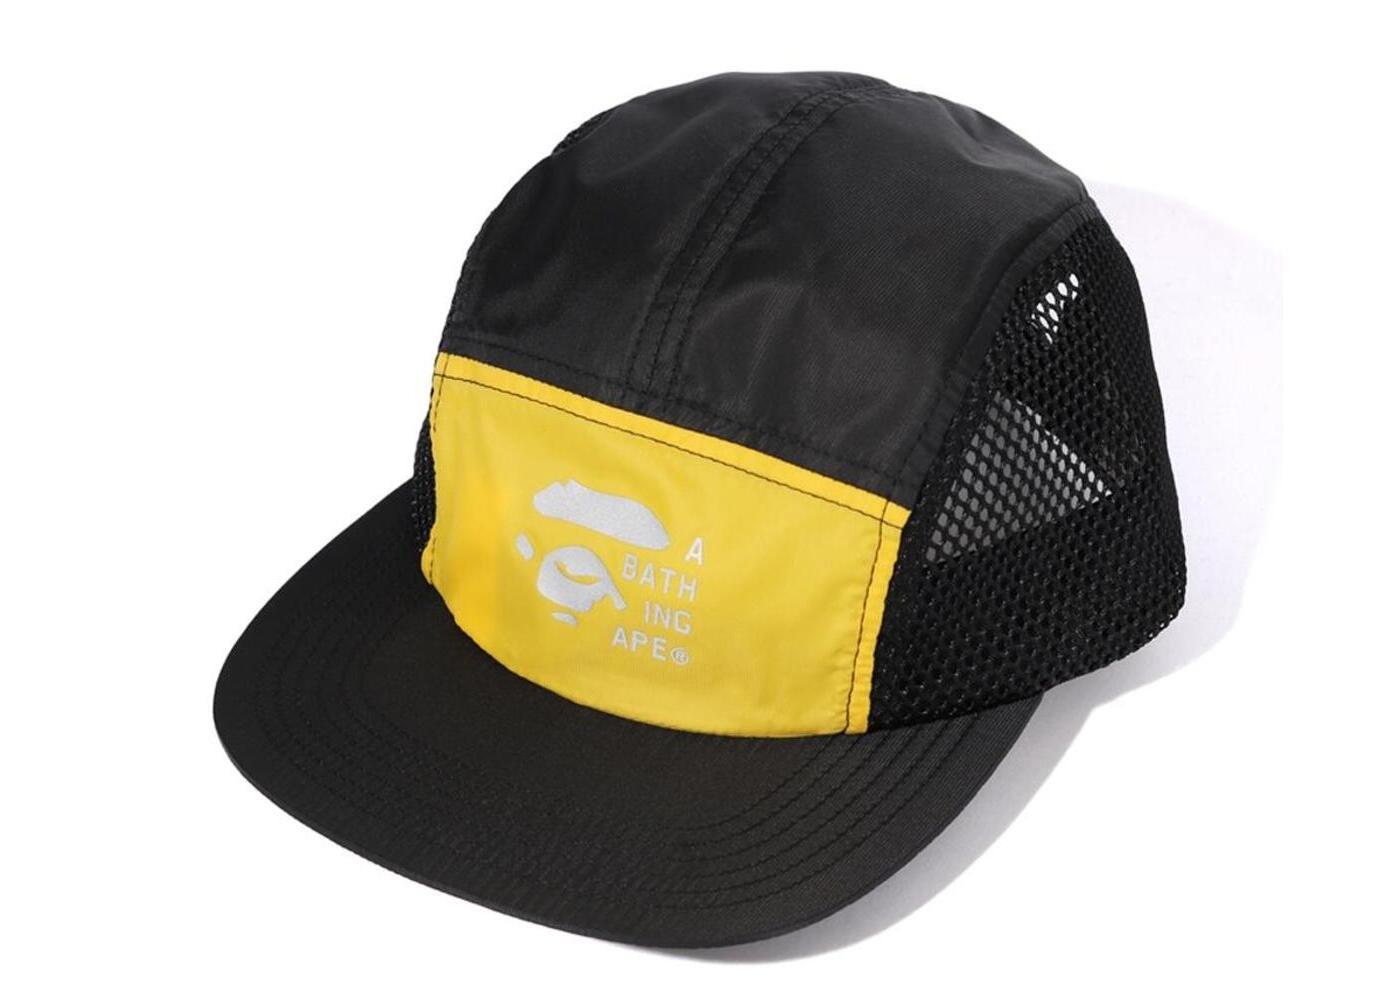 Bape 2tone Mesh Jet Cap Yellow (SS20)の写真